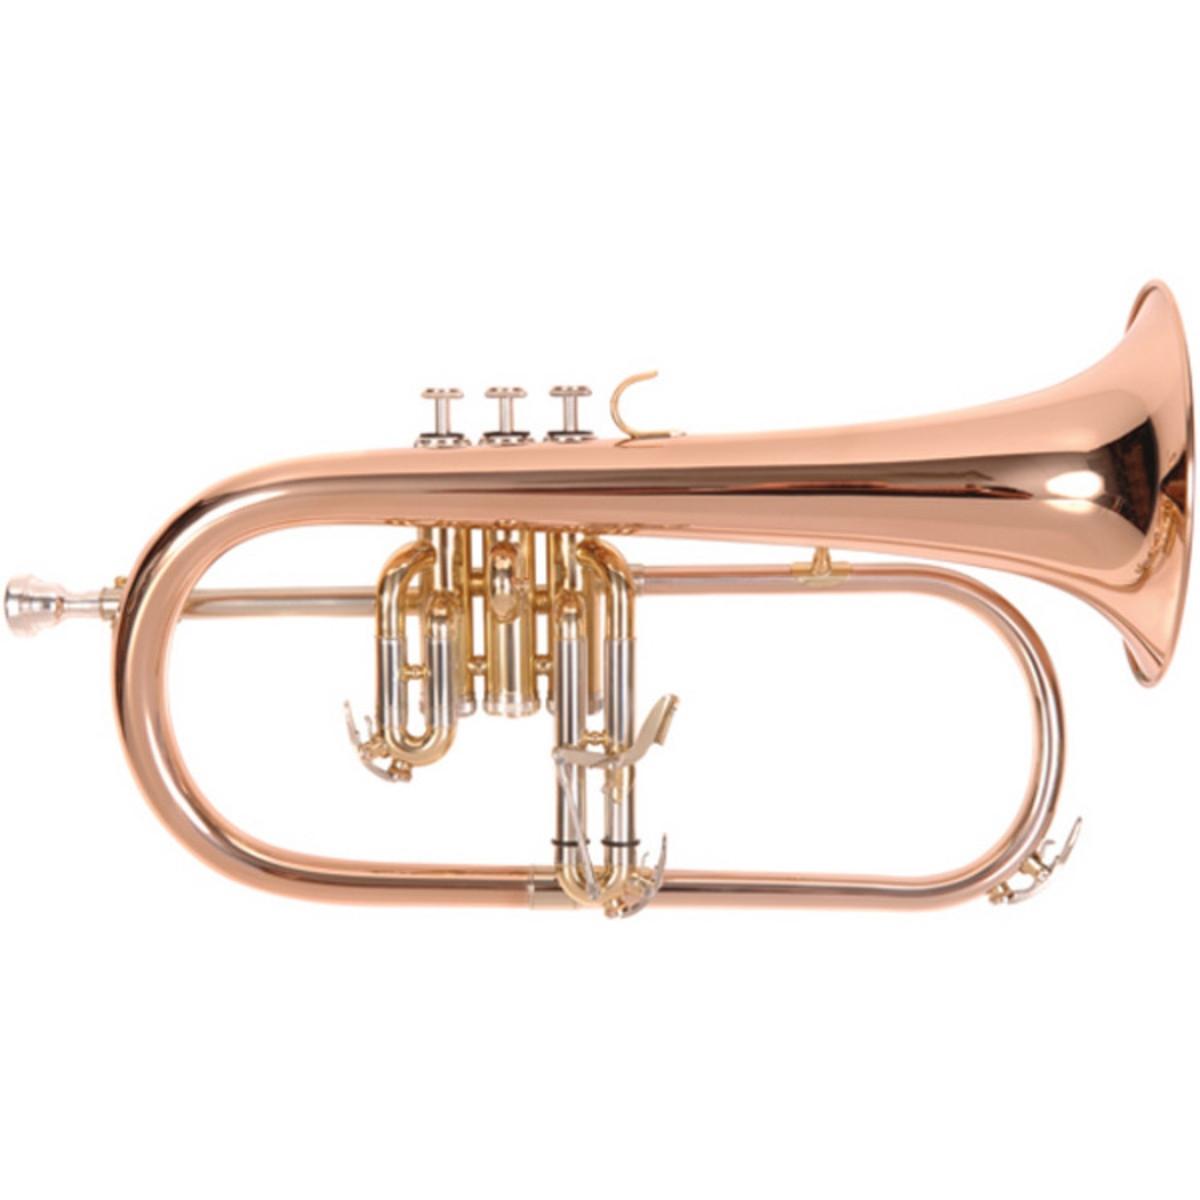 The Odyssey OFG1300 Premiere Flugel Horn: Review by Roger Moisan.